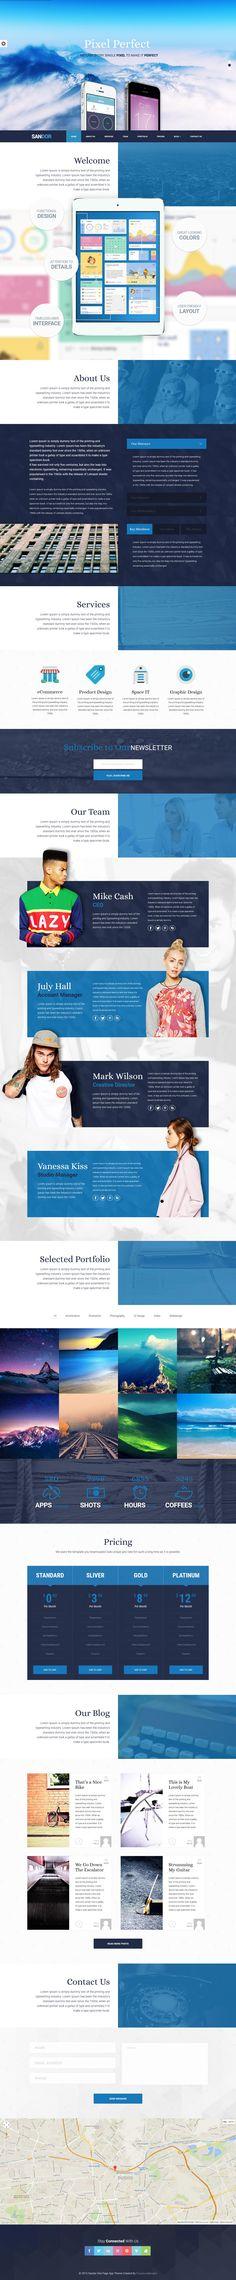 Sandor WordPress Theme - Design Drips Wordpress Theme Design, Web Design, Design Web, Website Designs, Site Design